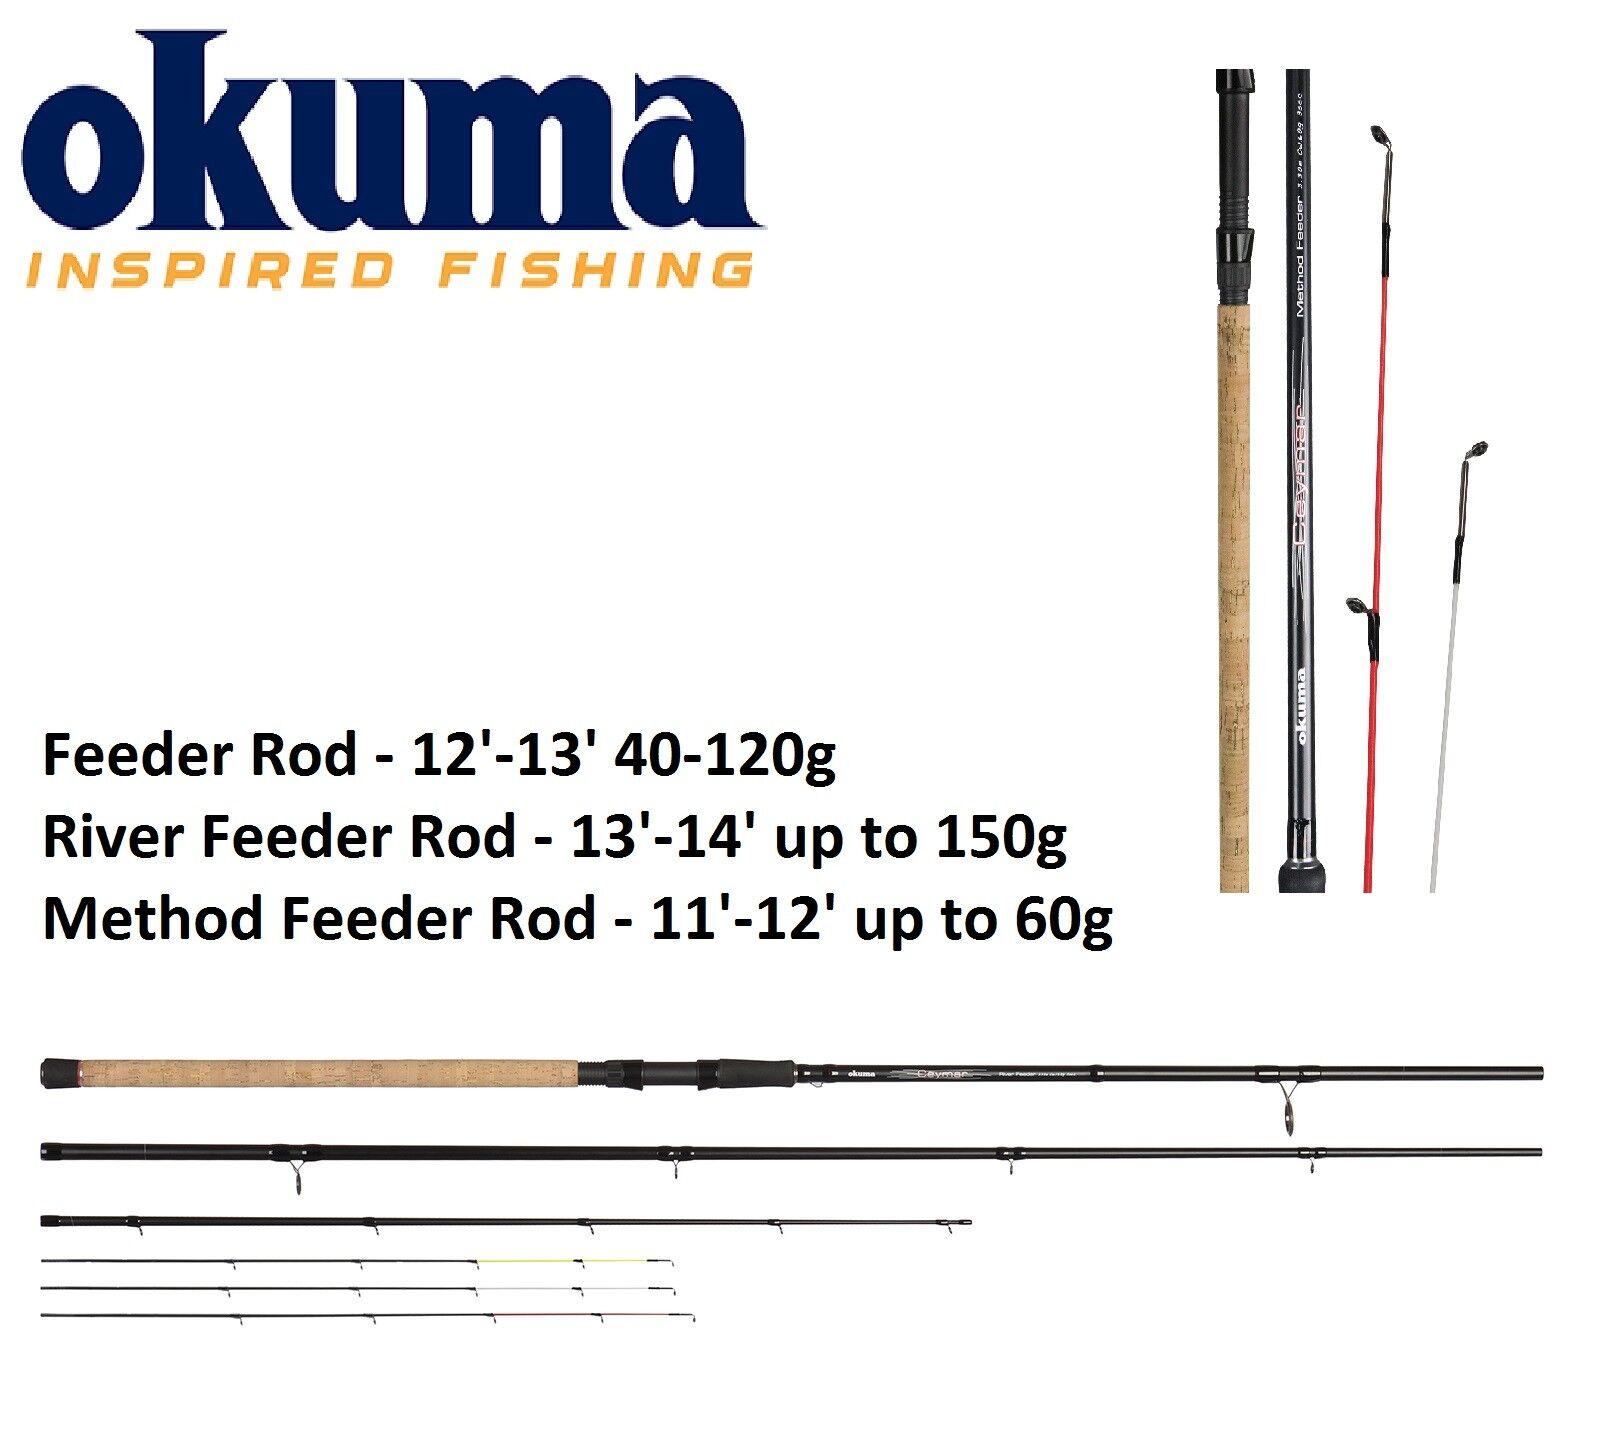 Neu 2018 Okuma Okuma Okuma Ceymar Streichholz Feeder Angelrute Methode Fluss Karpfenangeln 524c3c